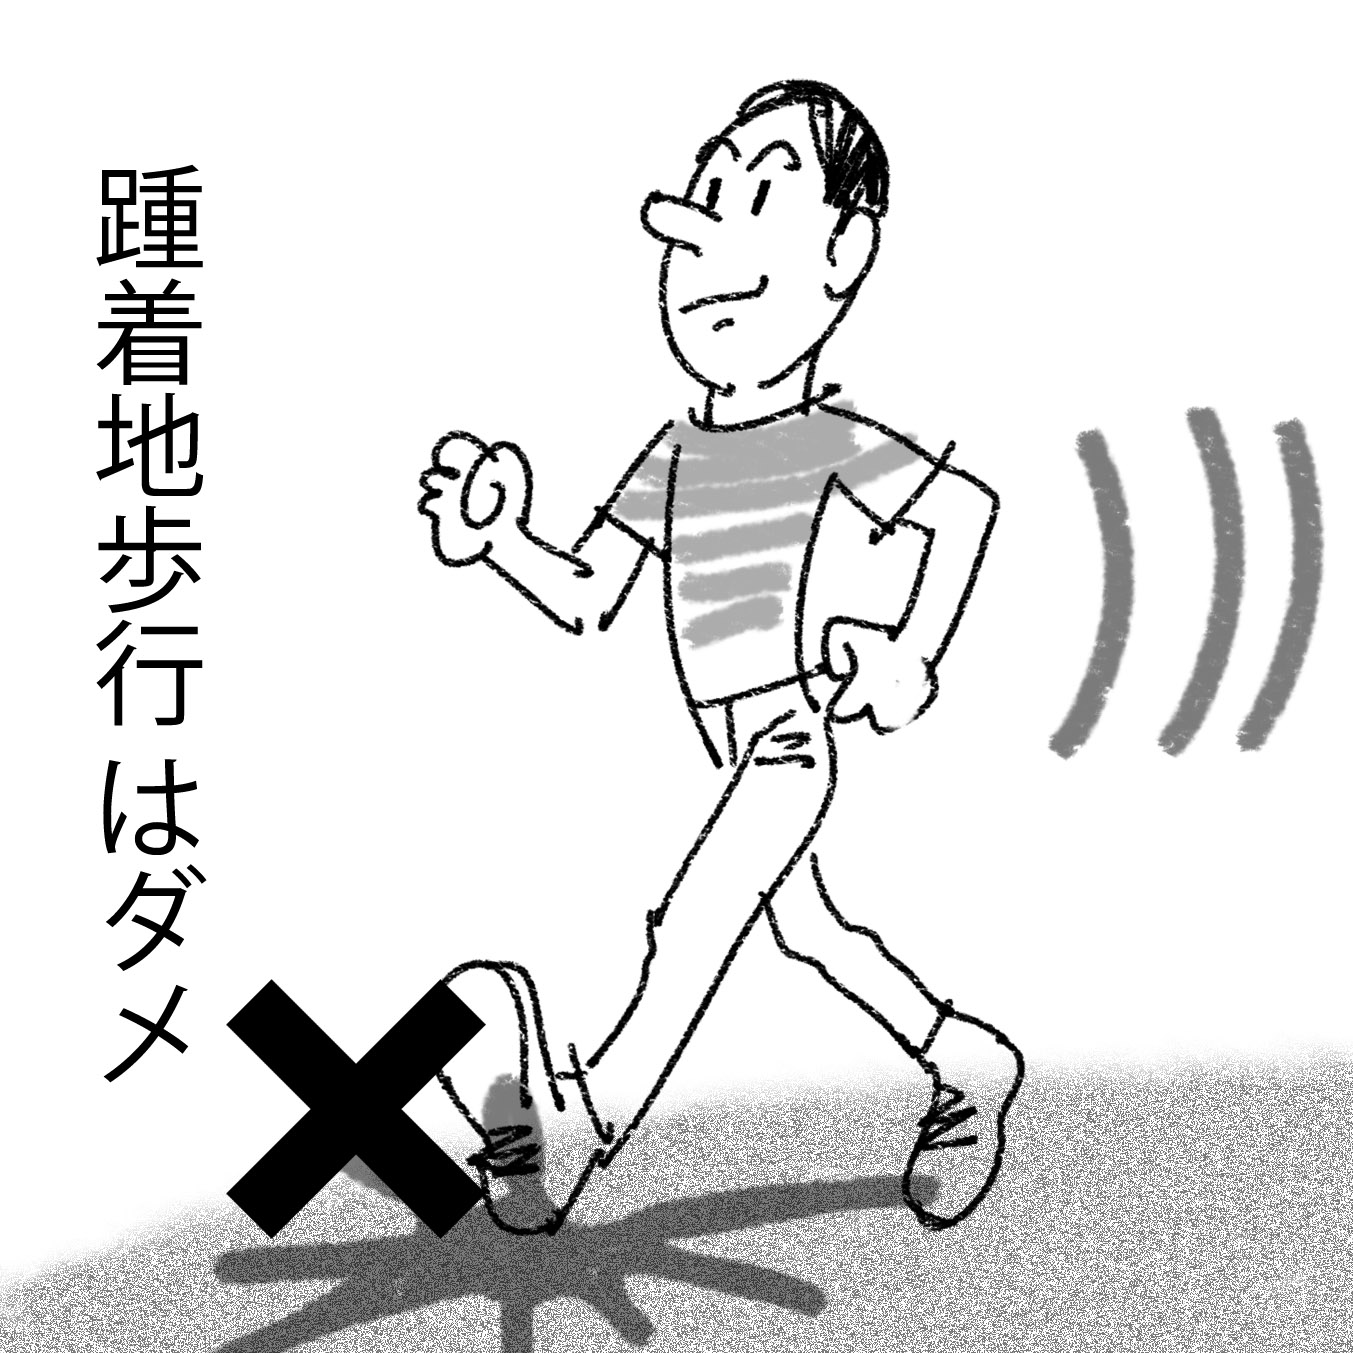 20130729column_健康【踵着地はいけない】